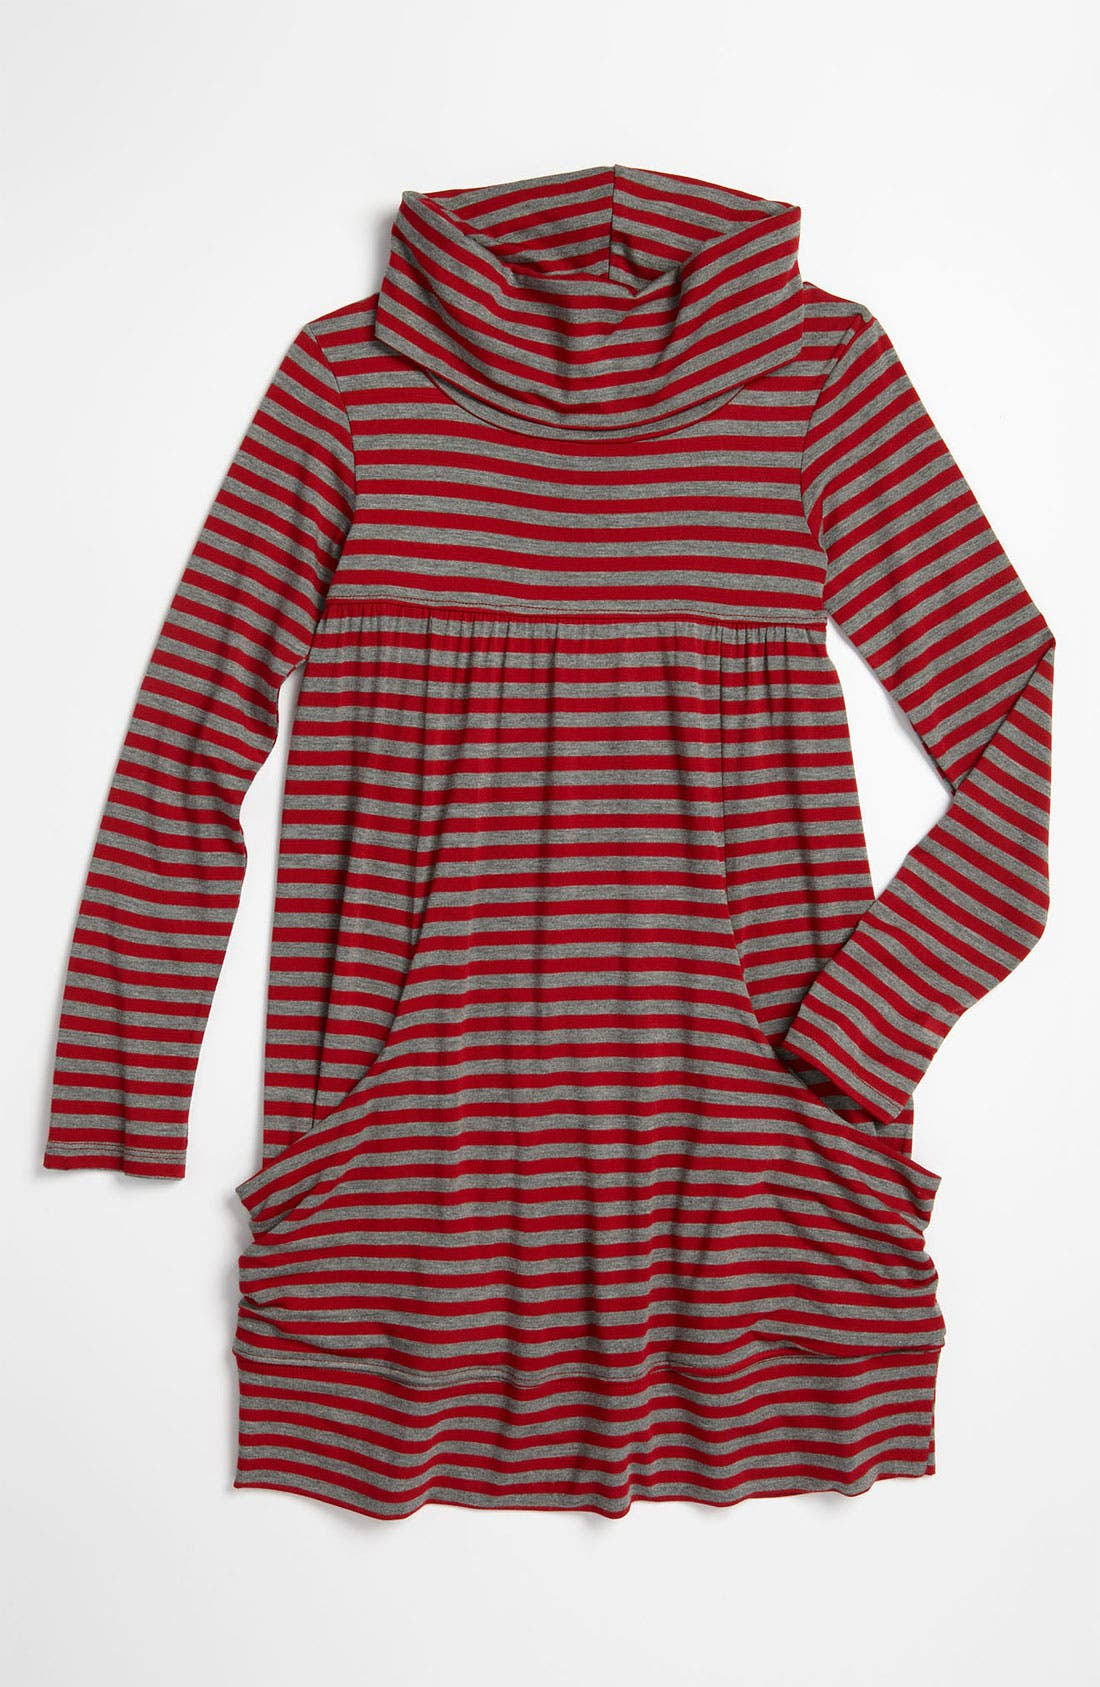 Alternate Image 1 Selected - United Colors of Benetton Kids Stripe Dress (Little Girls & Big Girls)